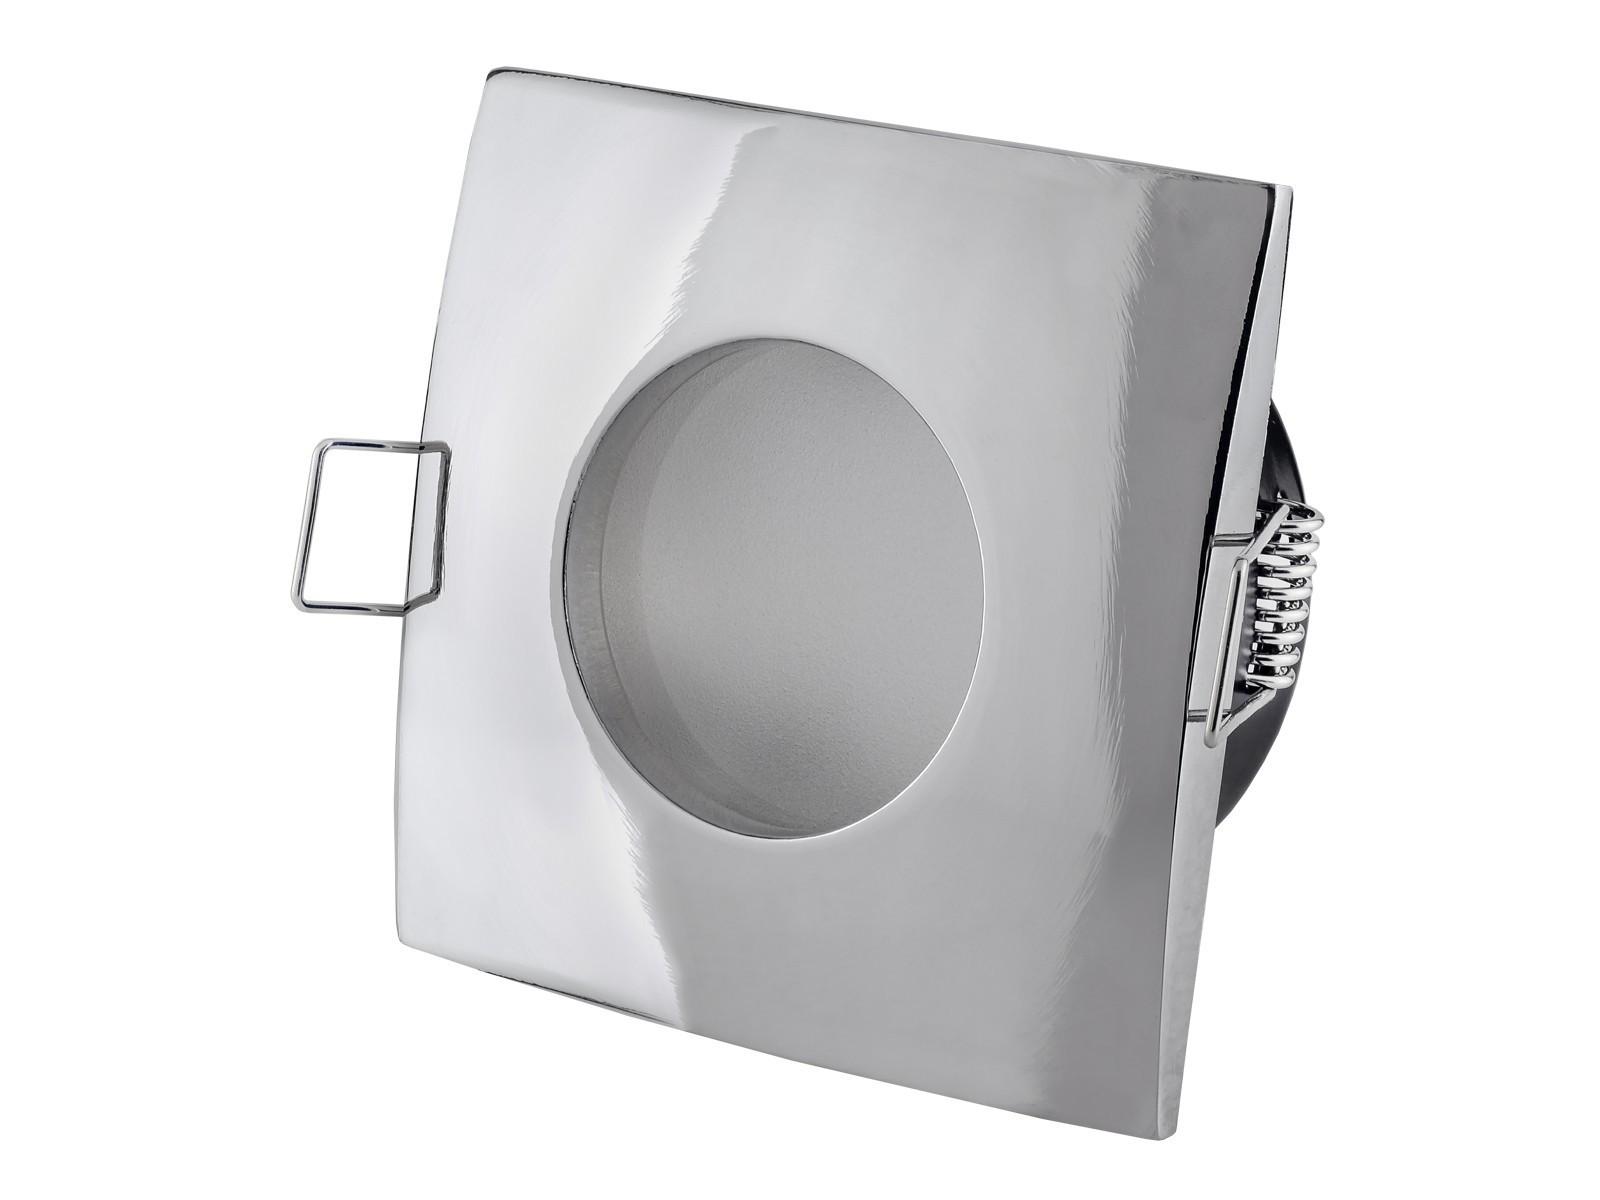 QW-1-chrom-shop-3-1600x1200 Fabelhafte Feuchtraum Led Einbaustrahler 230v Dekorationen